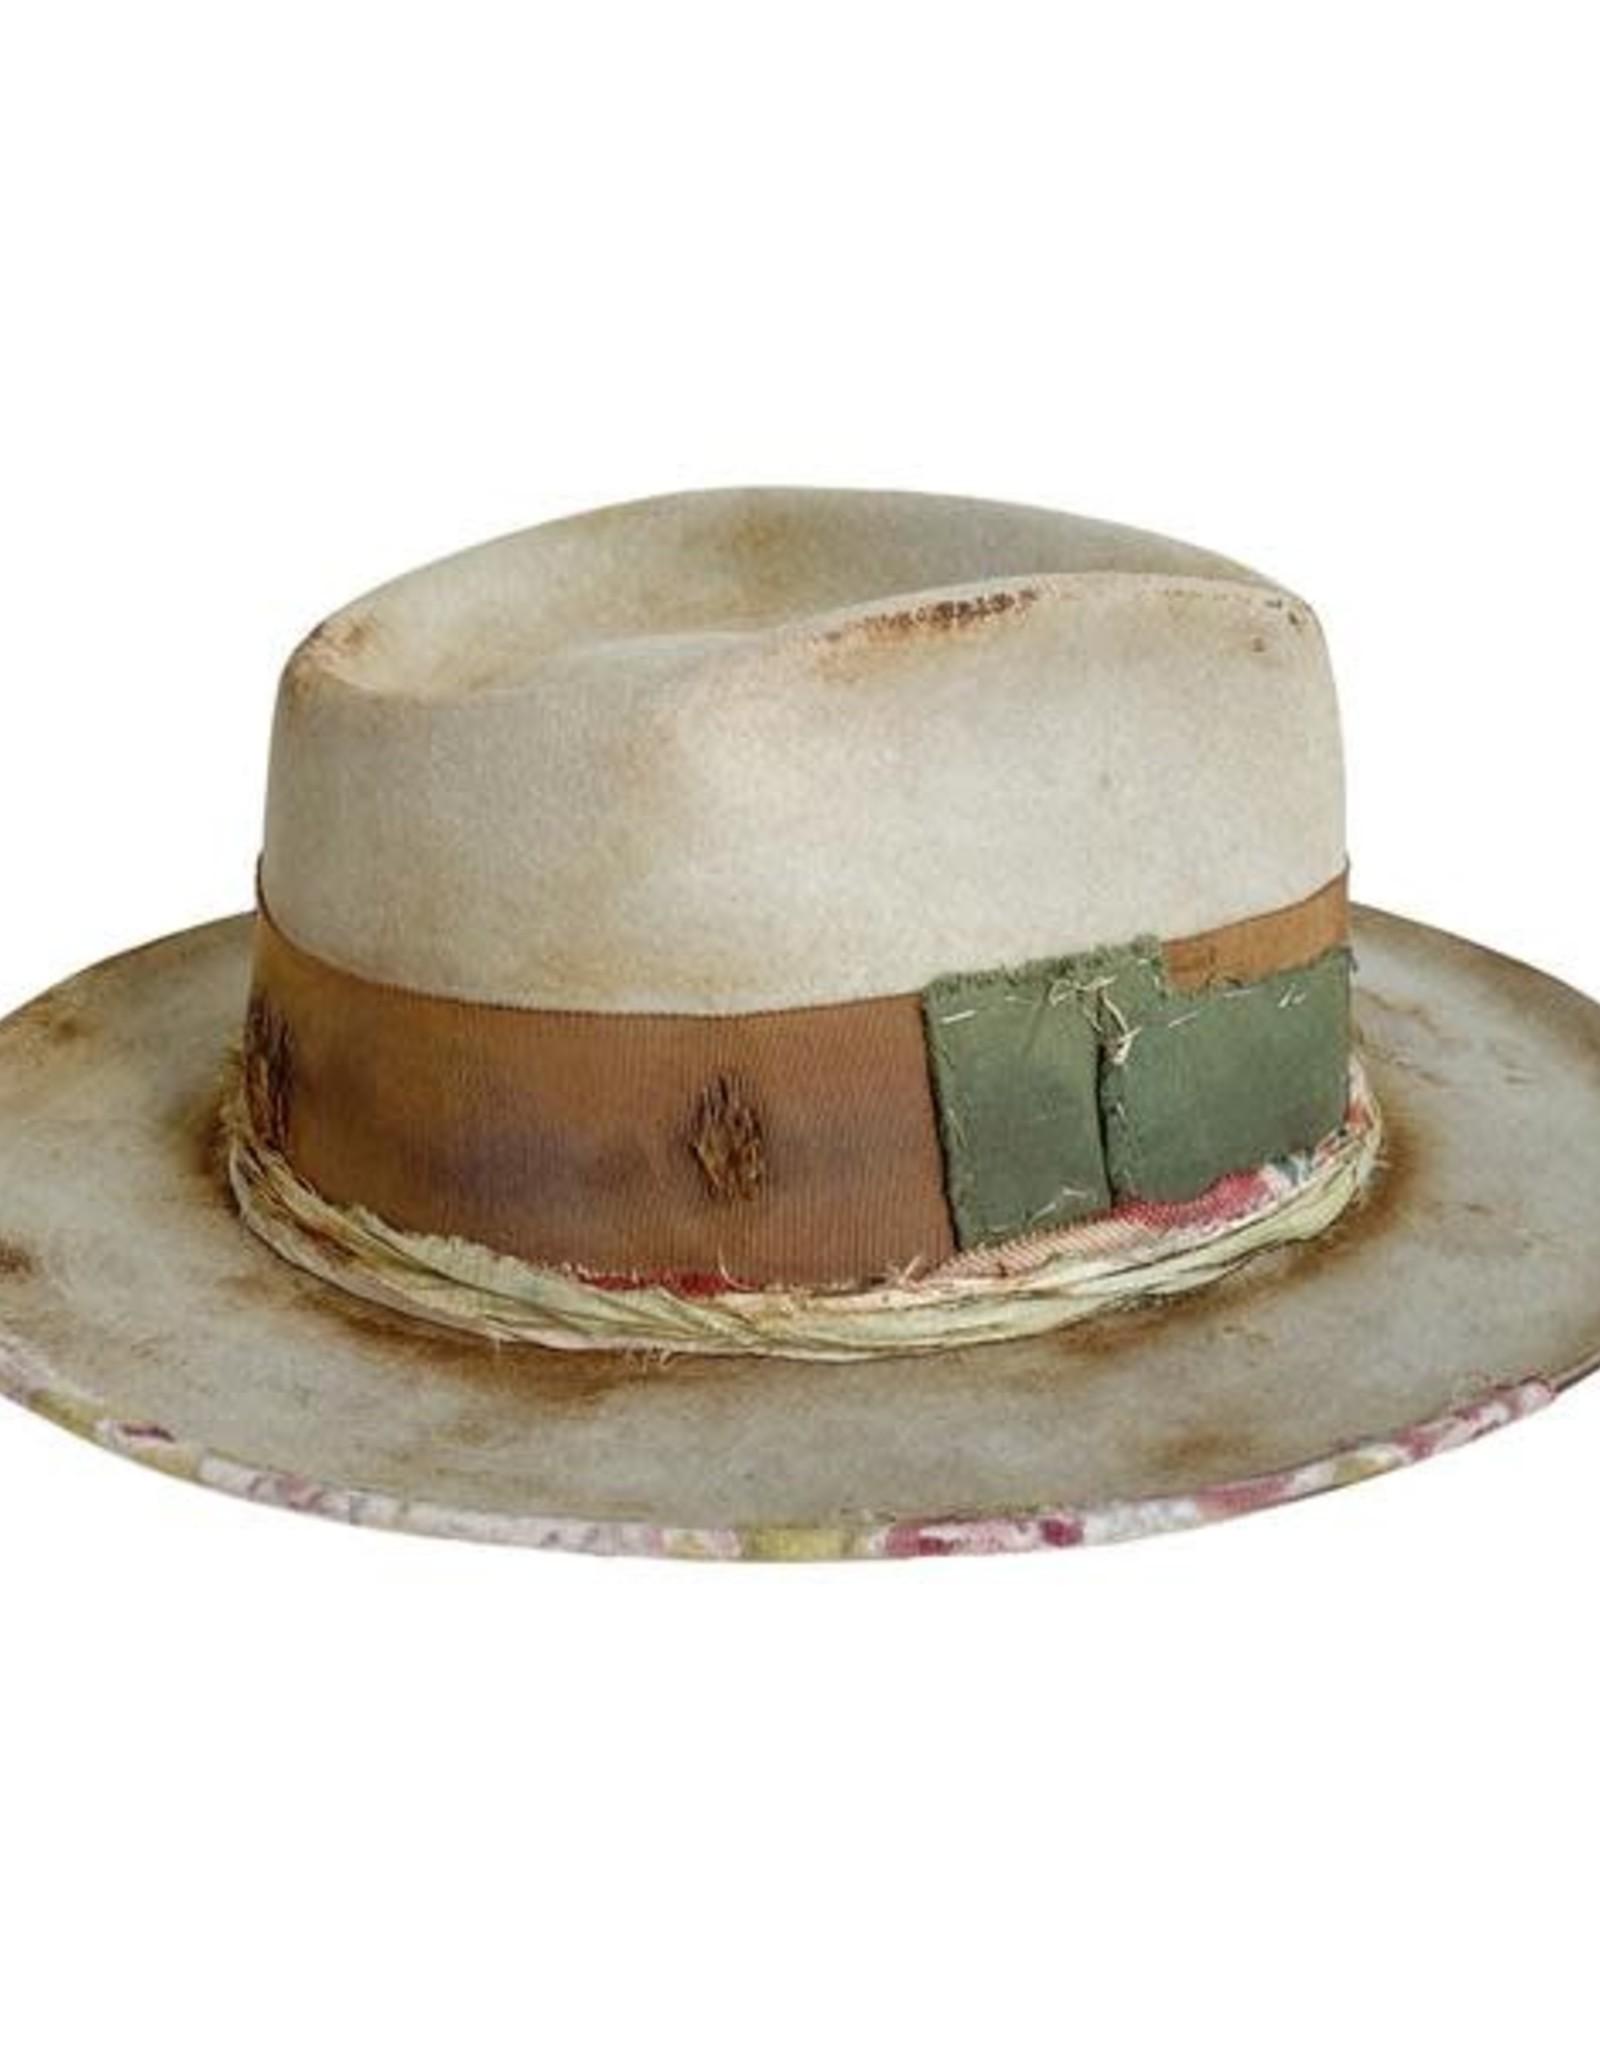 Teressa Foglia Urania Hat